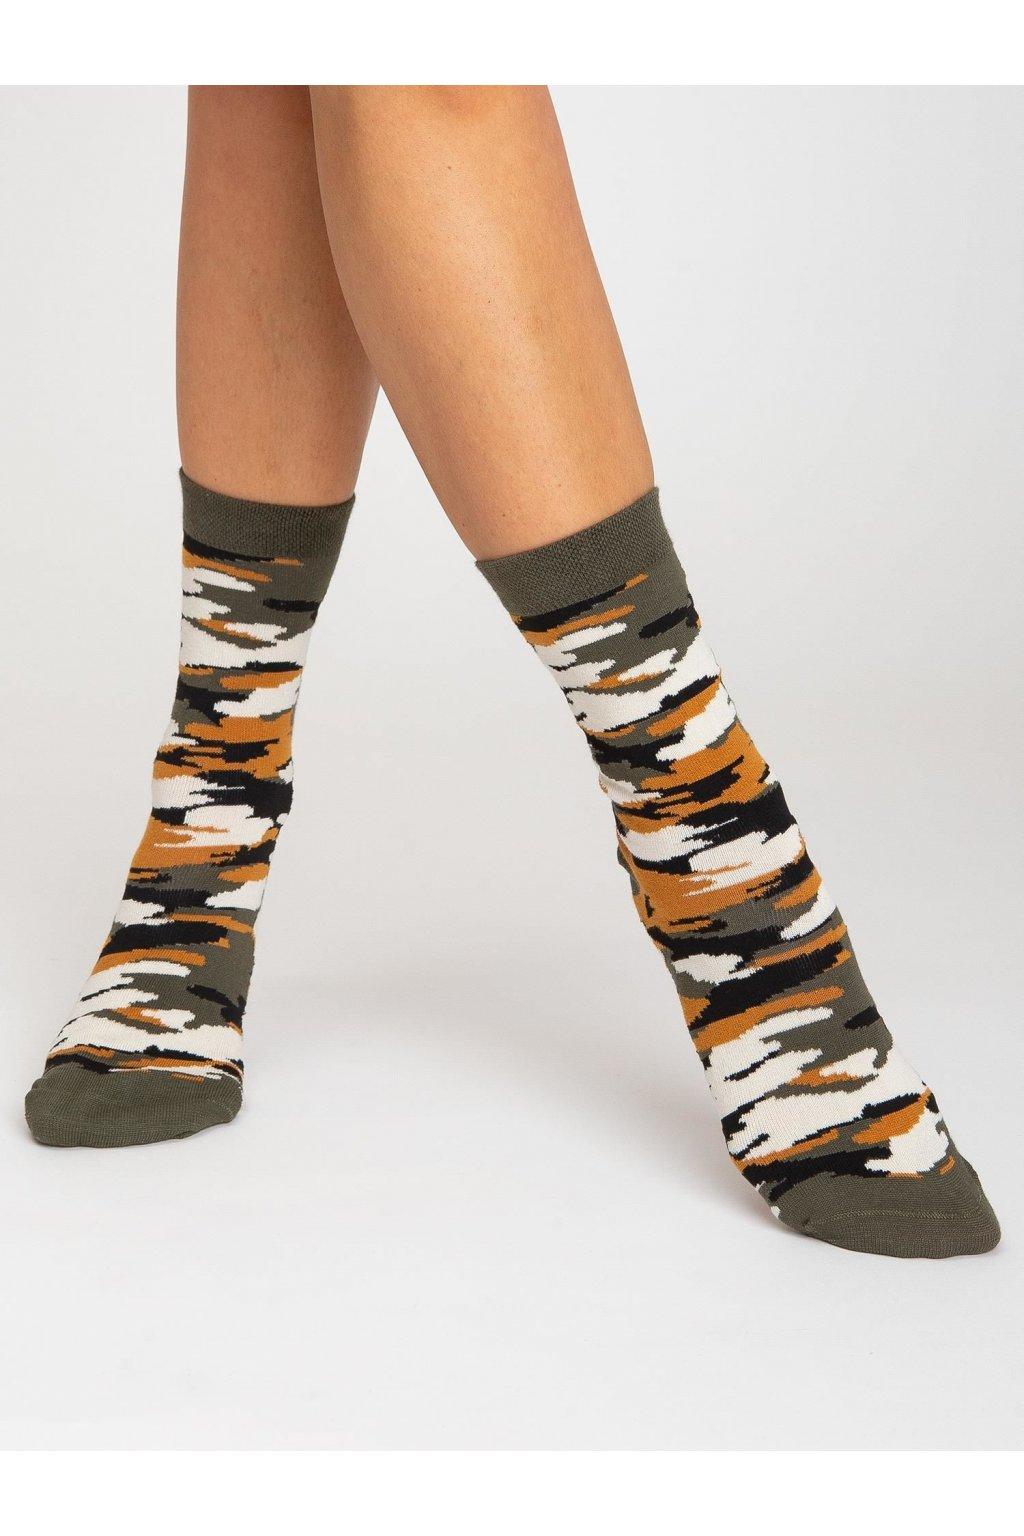 Dámske ponožky kód WS-SR-5051